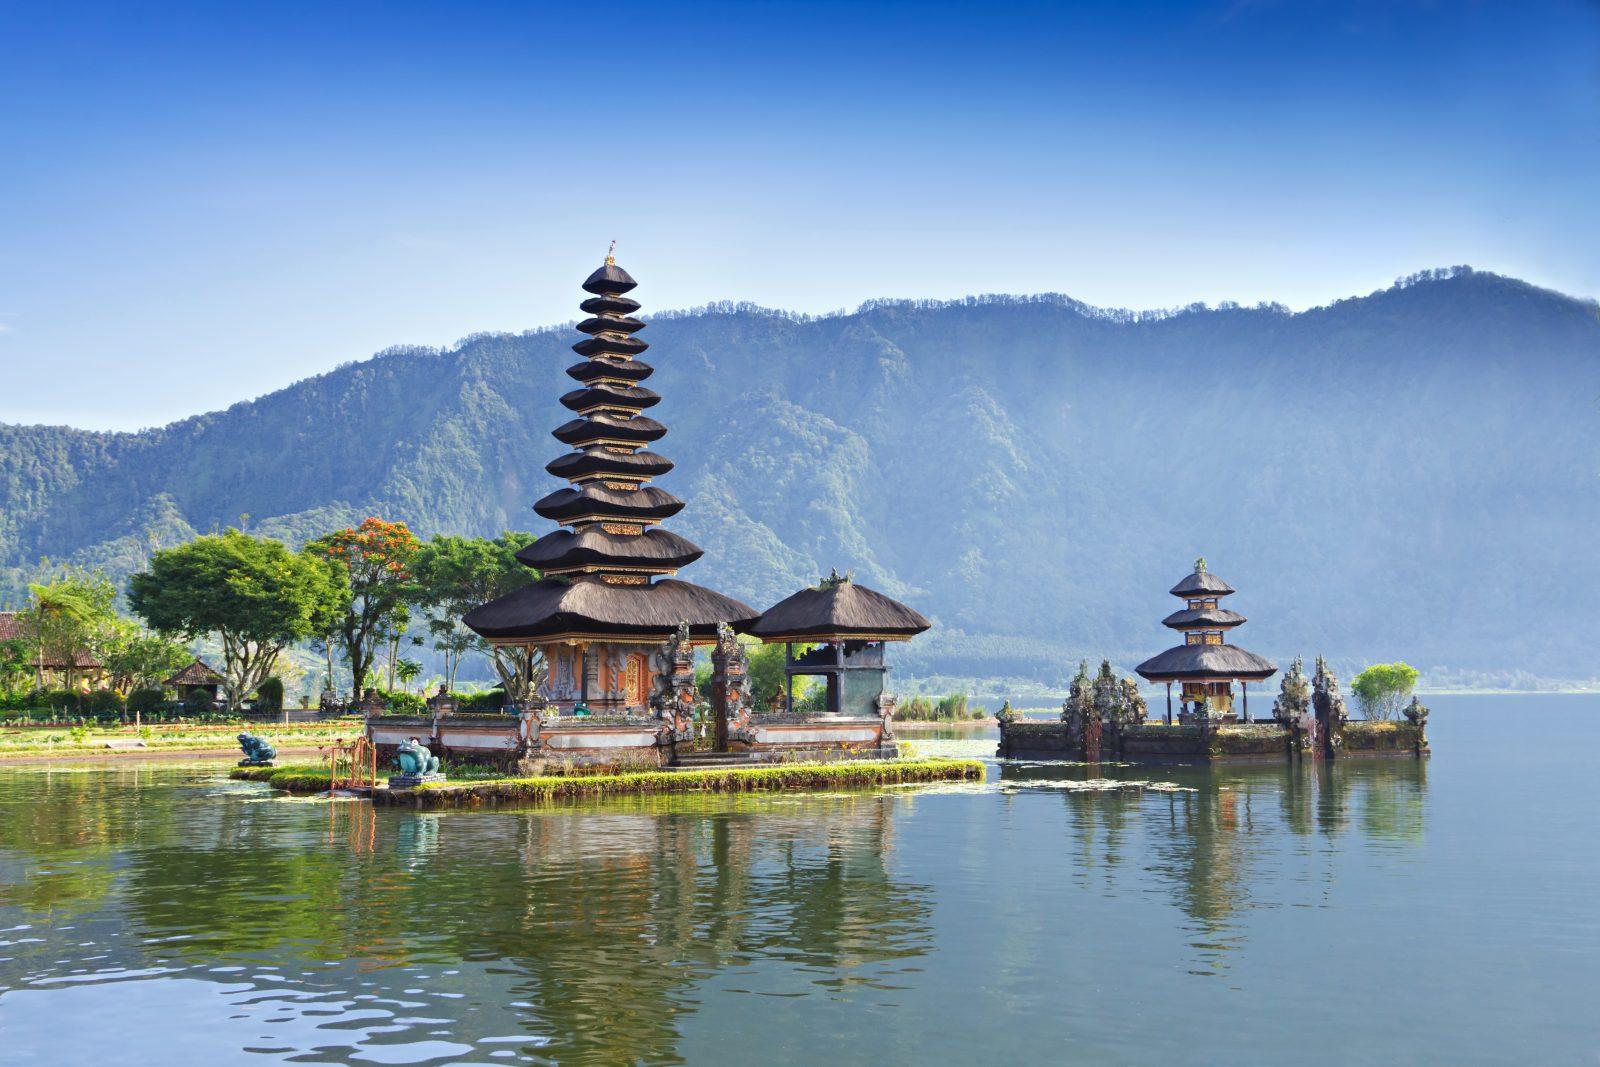 AIS Serande ทริปท่องเที่ยว Bali